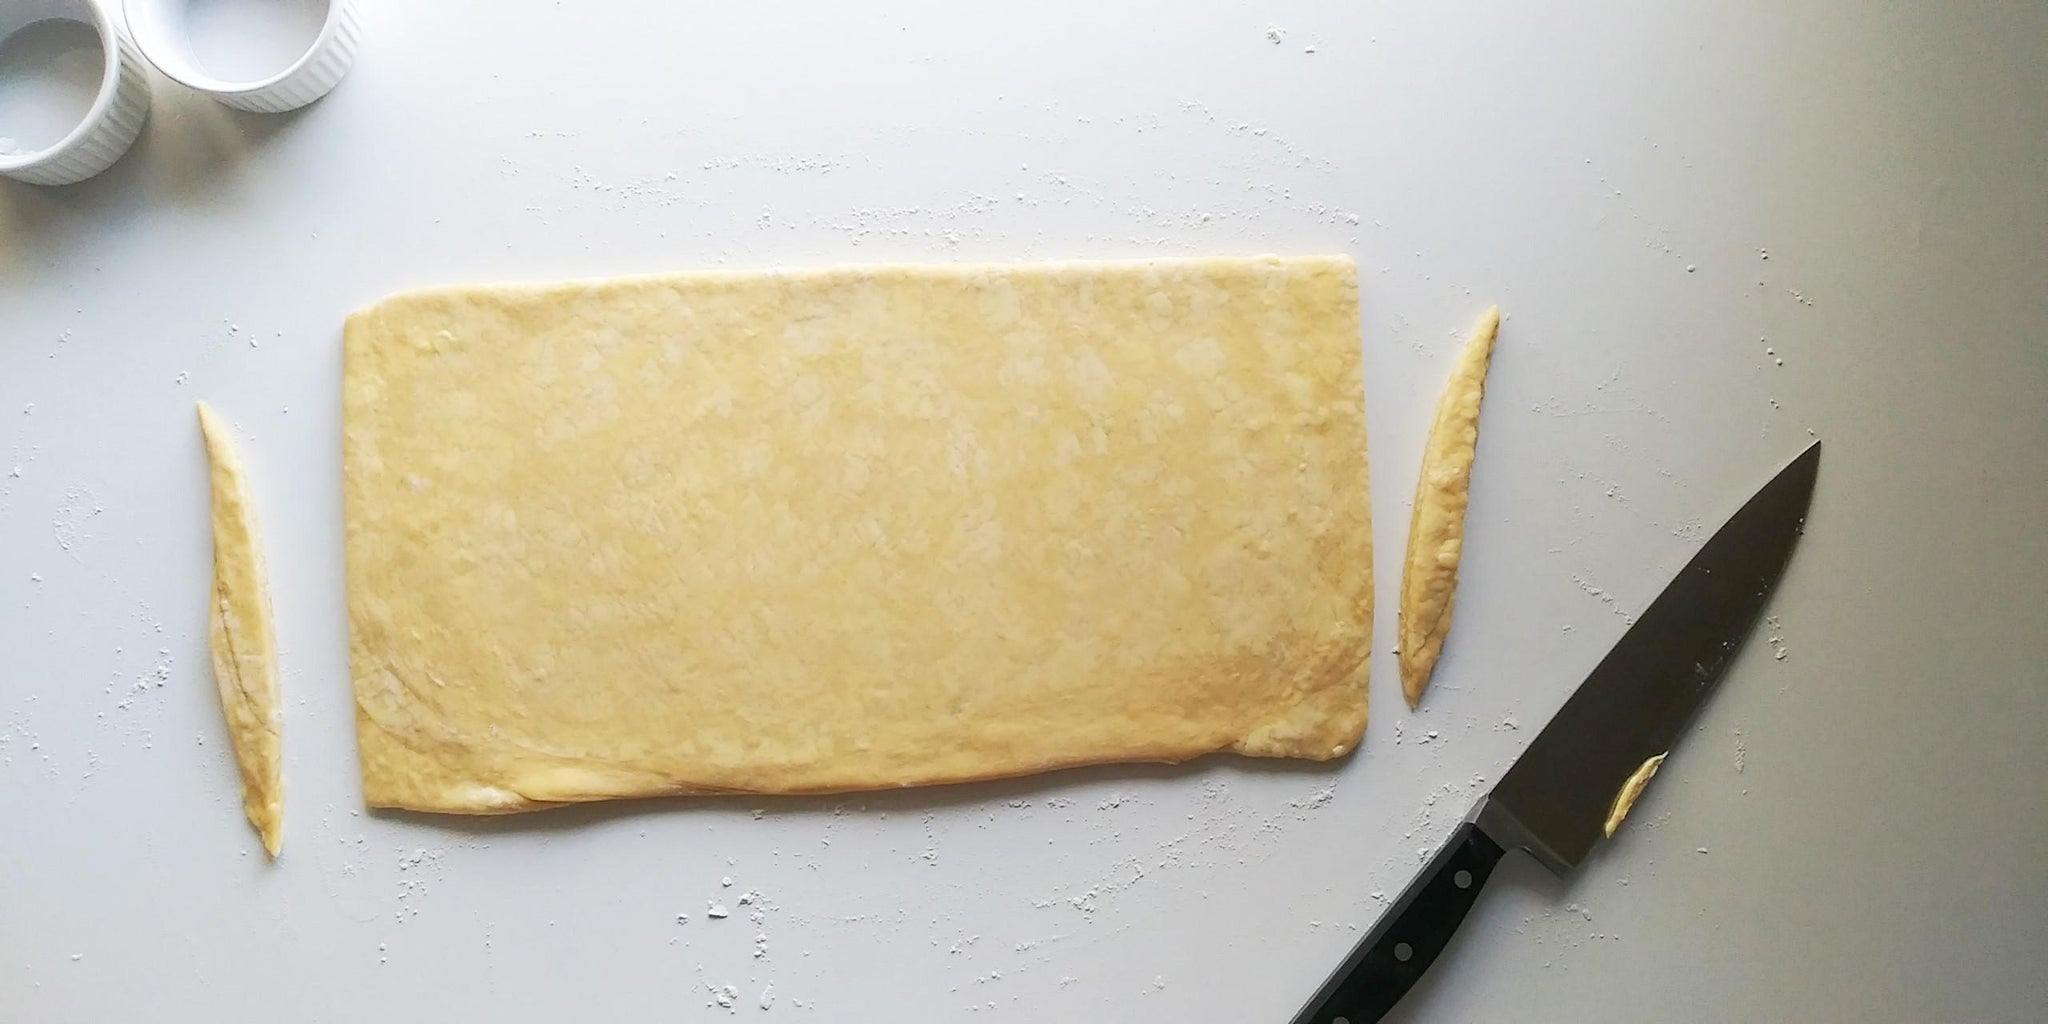 Time to Make the Chignon Croissants